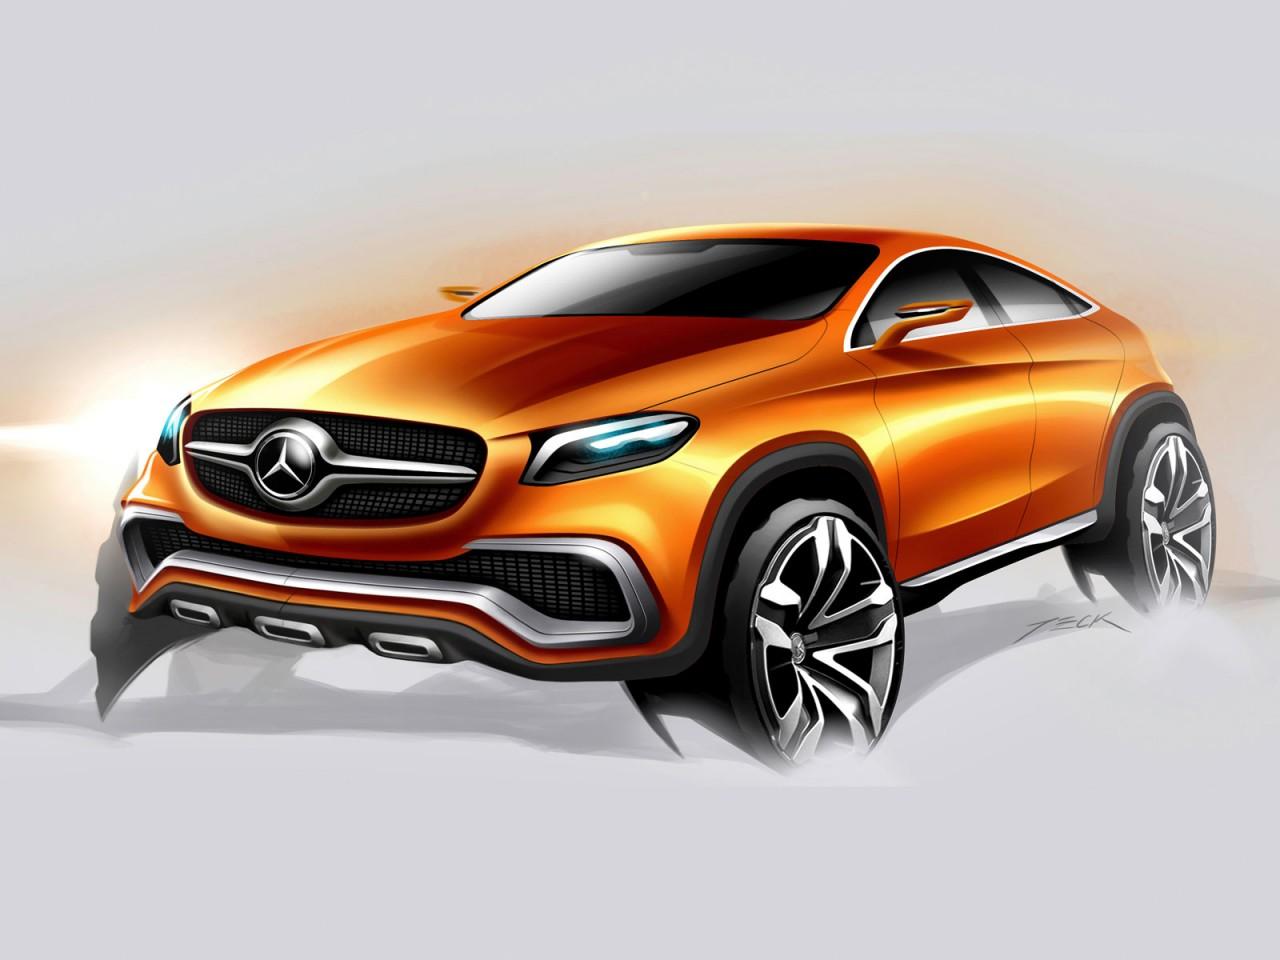 01-Mercedes-Benz-Concept-Coupe-SUV-Design-Sketch-01